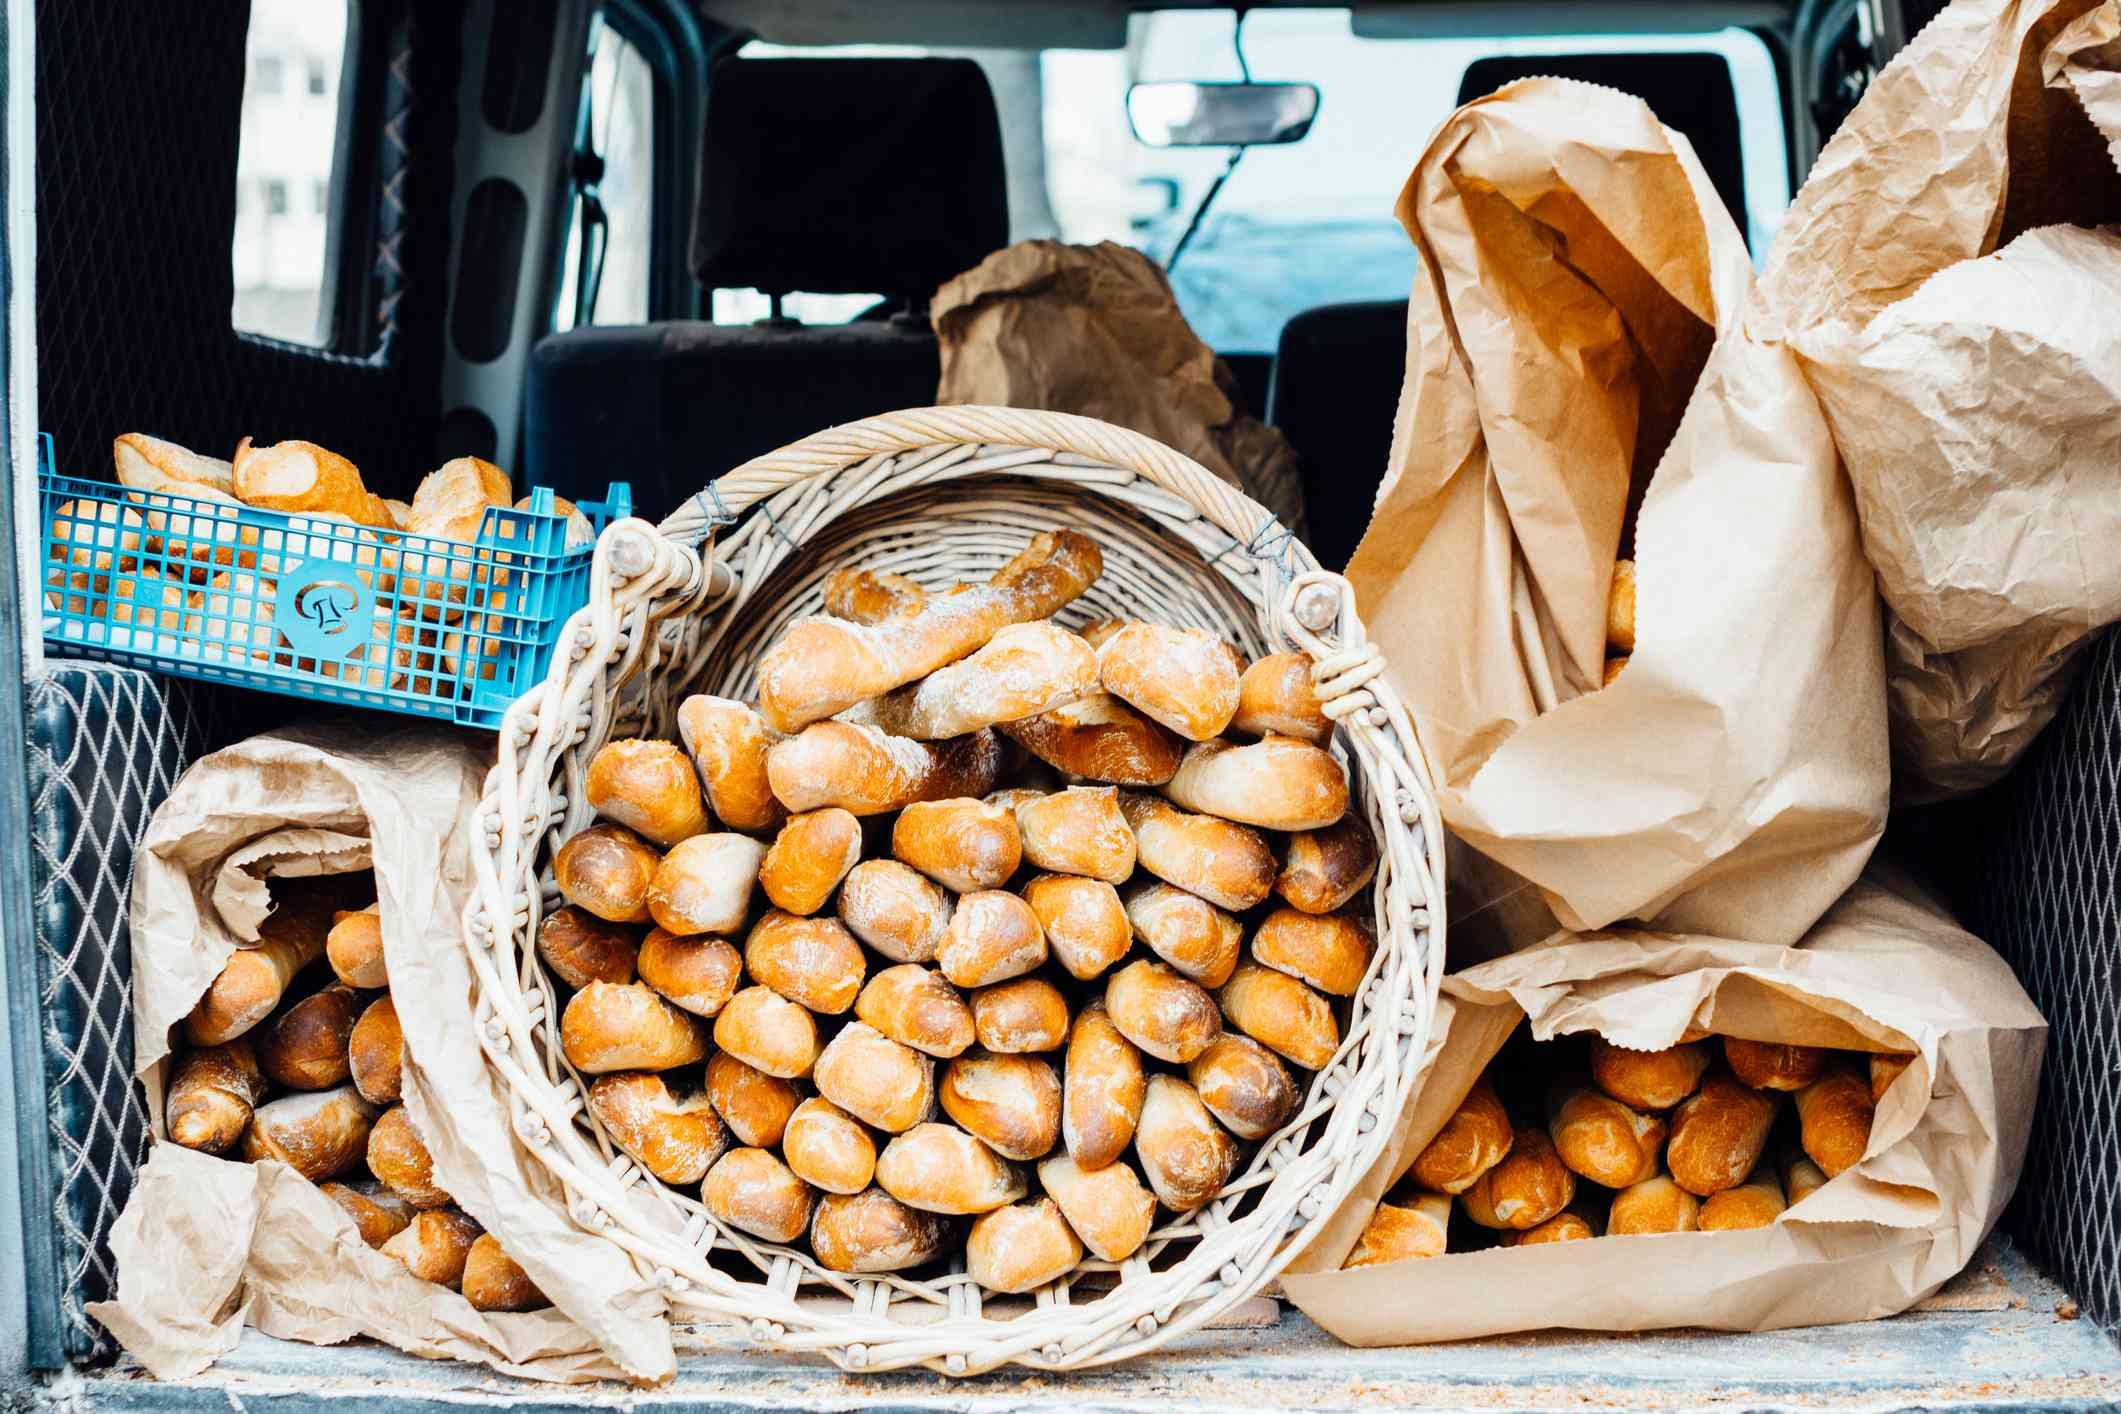 Car carrying baguettes in Paris, France